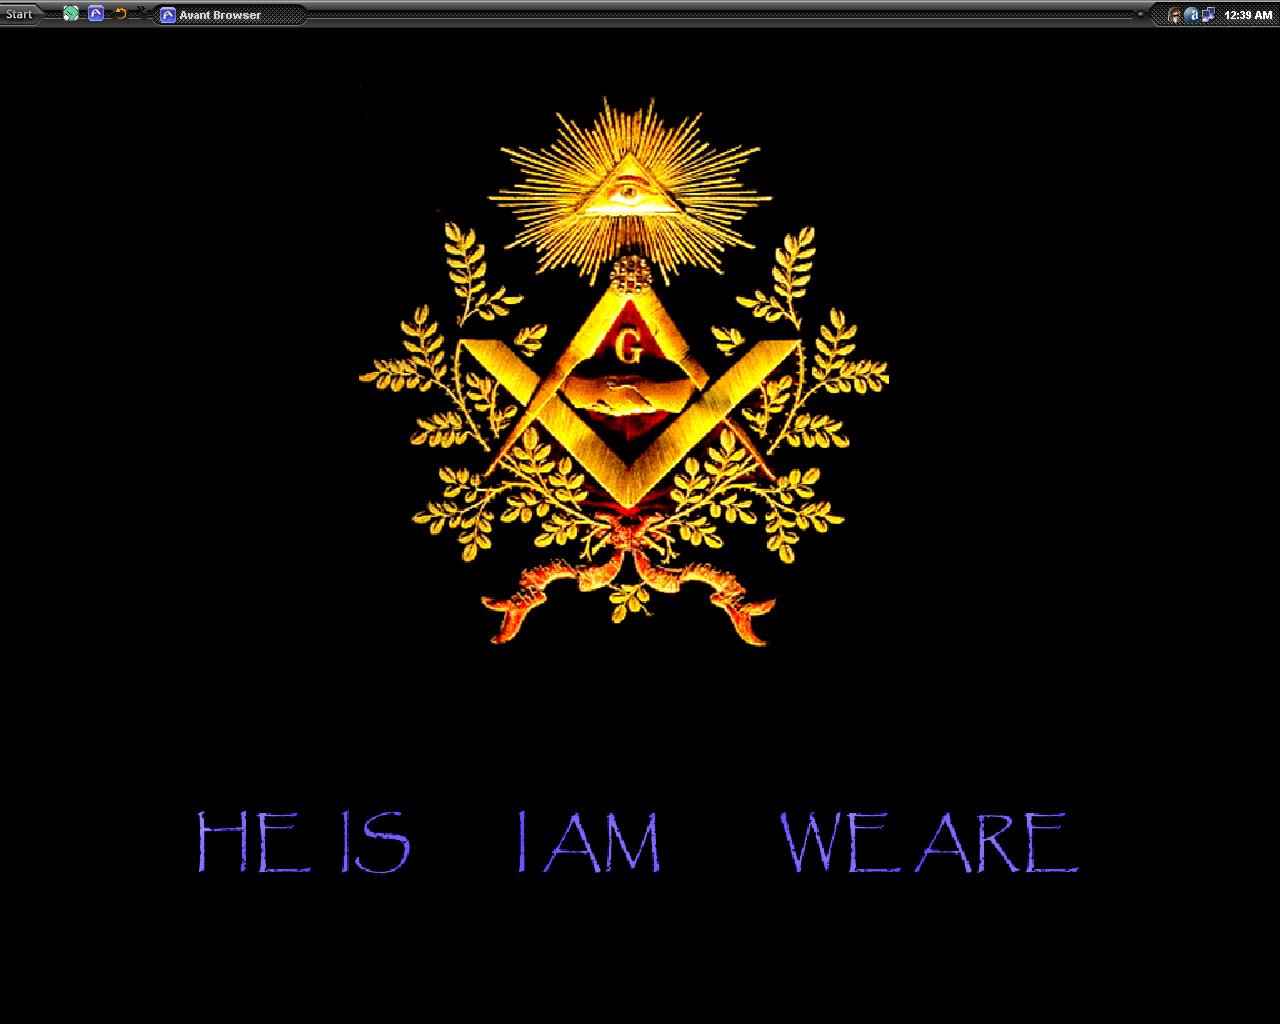 Masonic Desktop Wallpaper 22194 Wallpapers HD colourinwallpaper 1280x1024